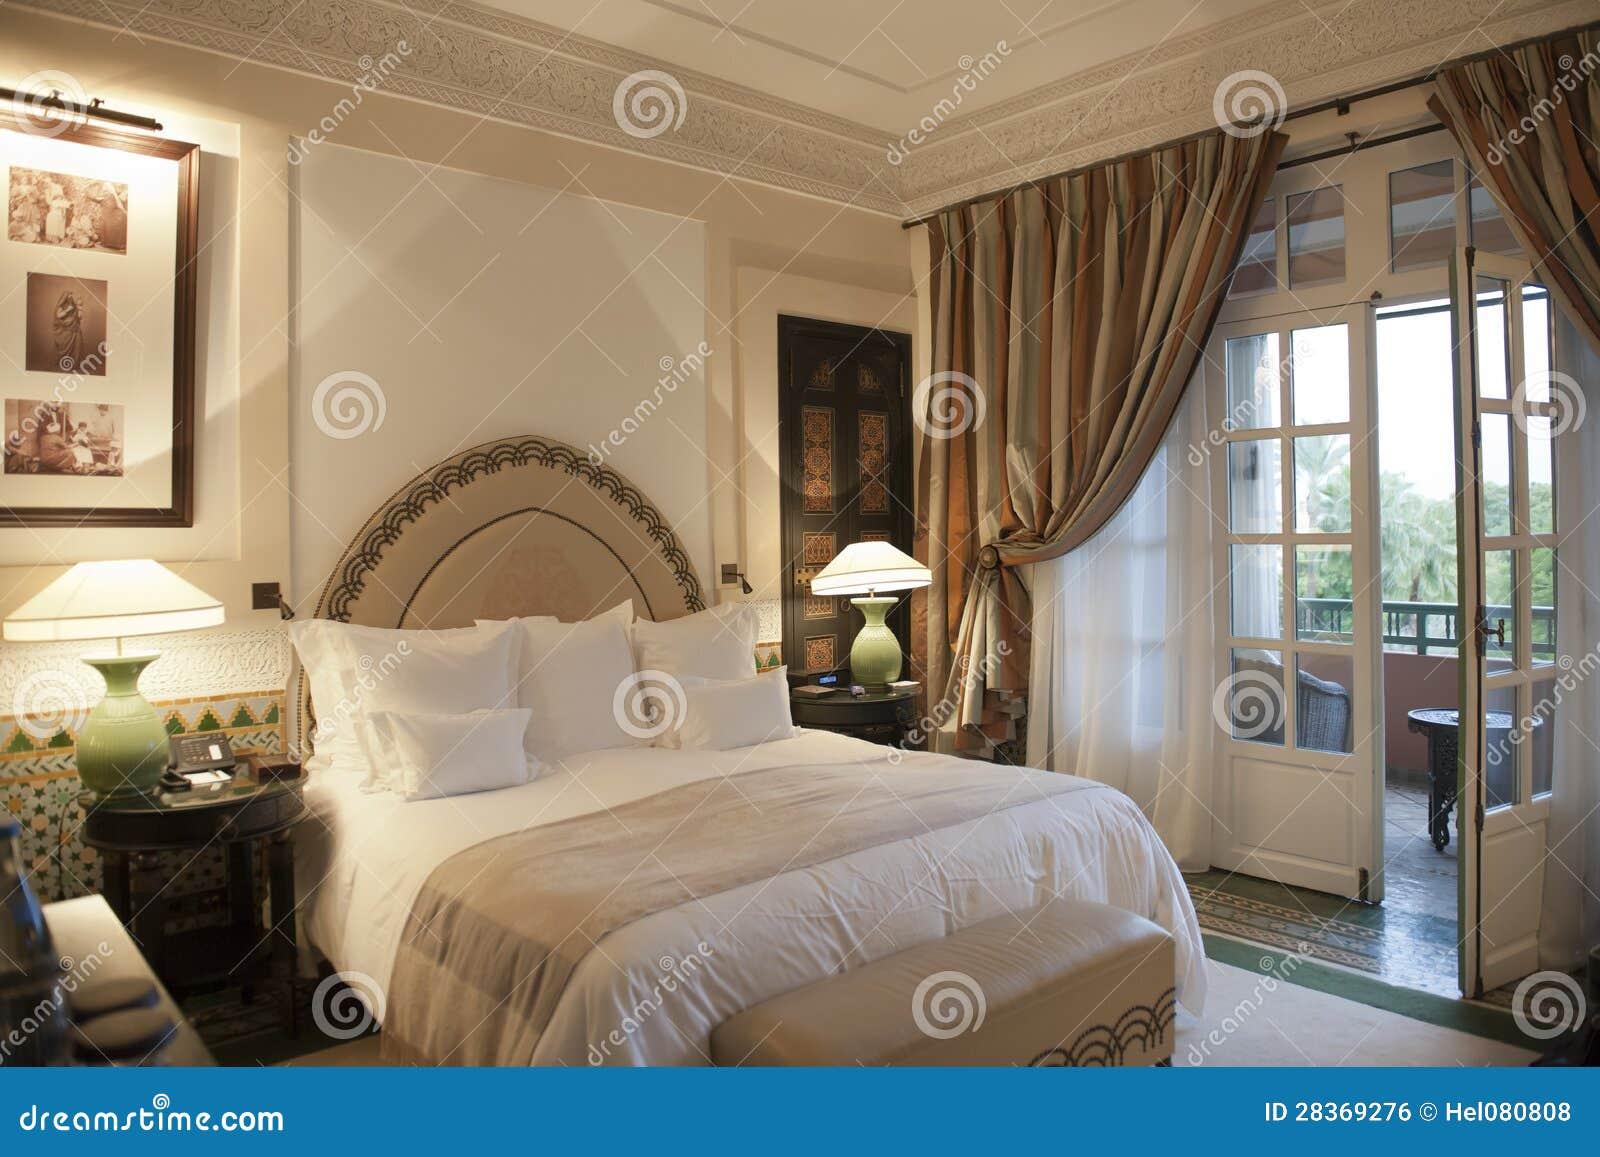 Surprising Hotel La Mamounia Marrakesh Stock Photo Image Of Morocco Download Free Architecture Designs Scobabritishbridgeorg